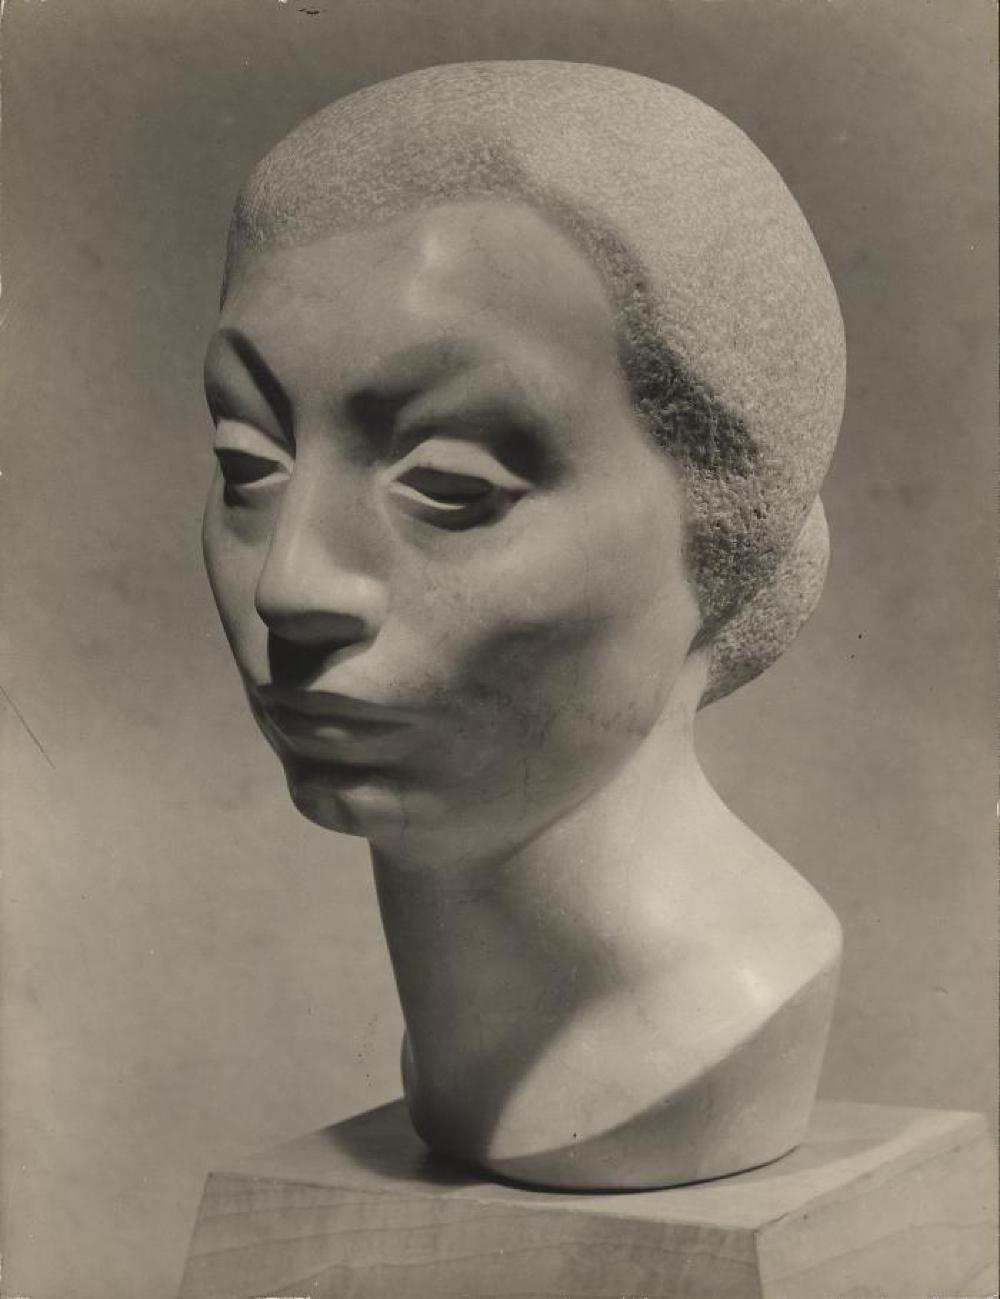 Aline MacMahon, image 5